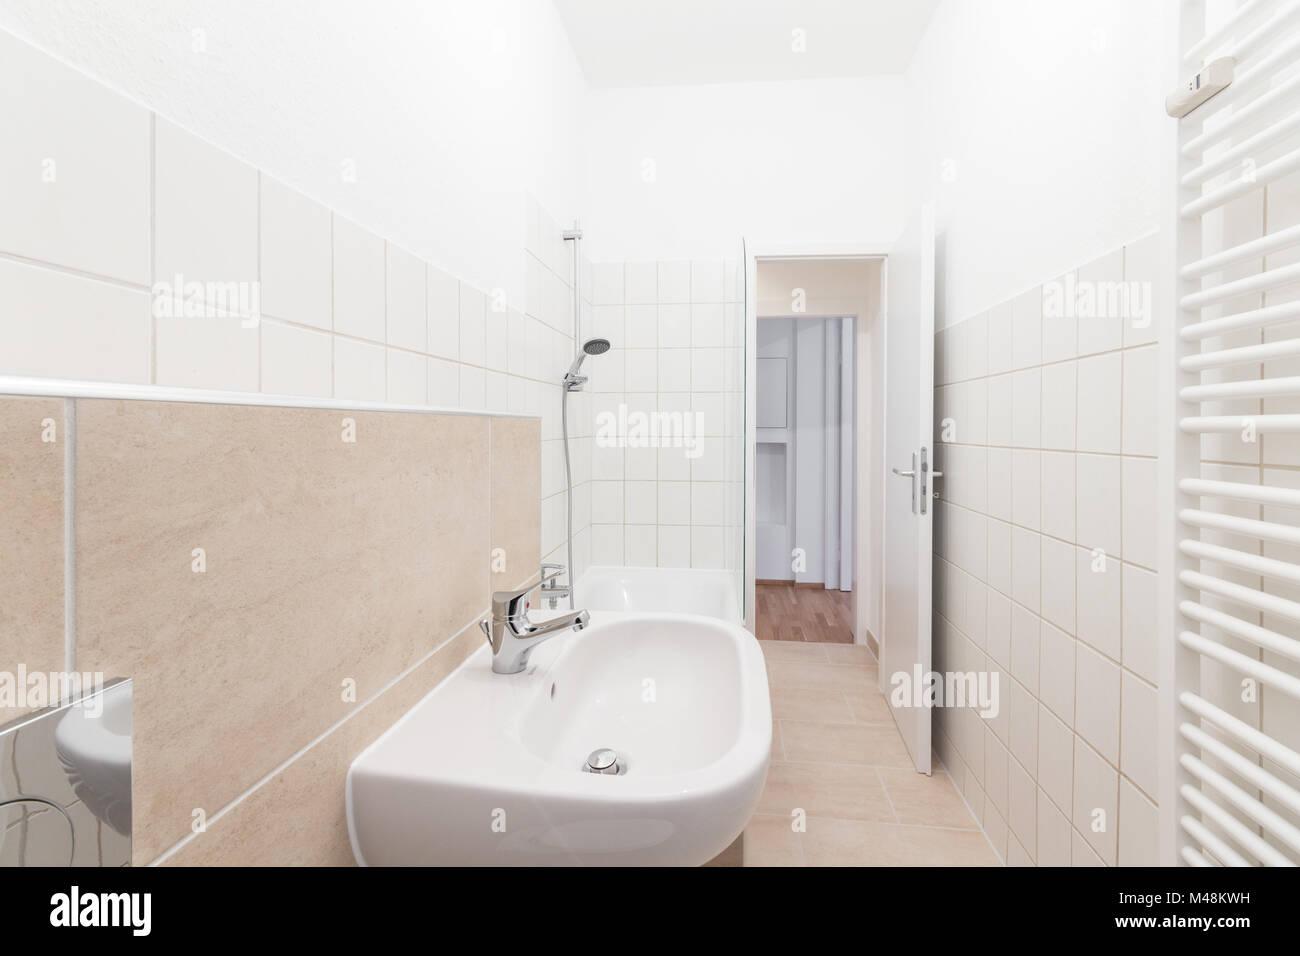 Neues Bad, geflieste Badezimmer - Immobilien Innenraum Stockfoto ...